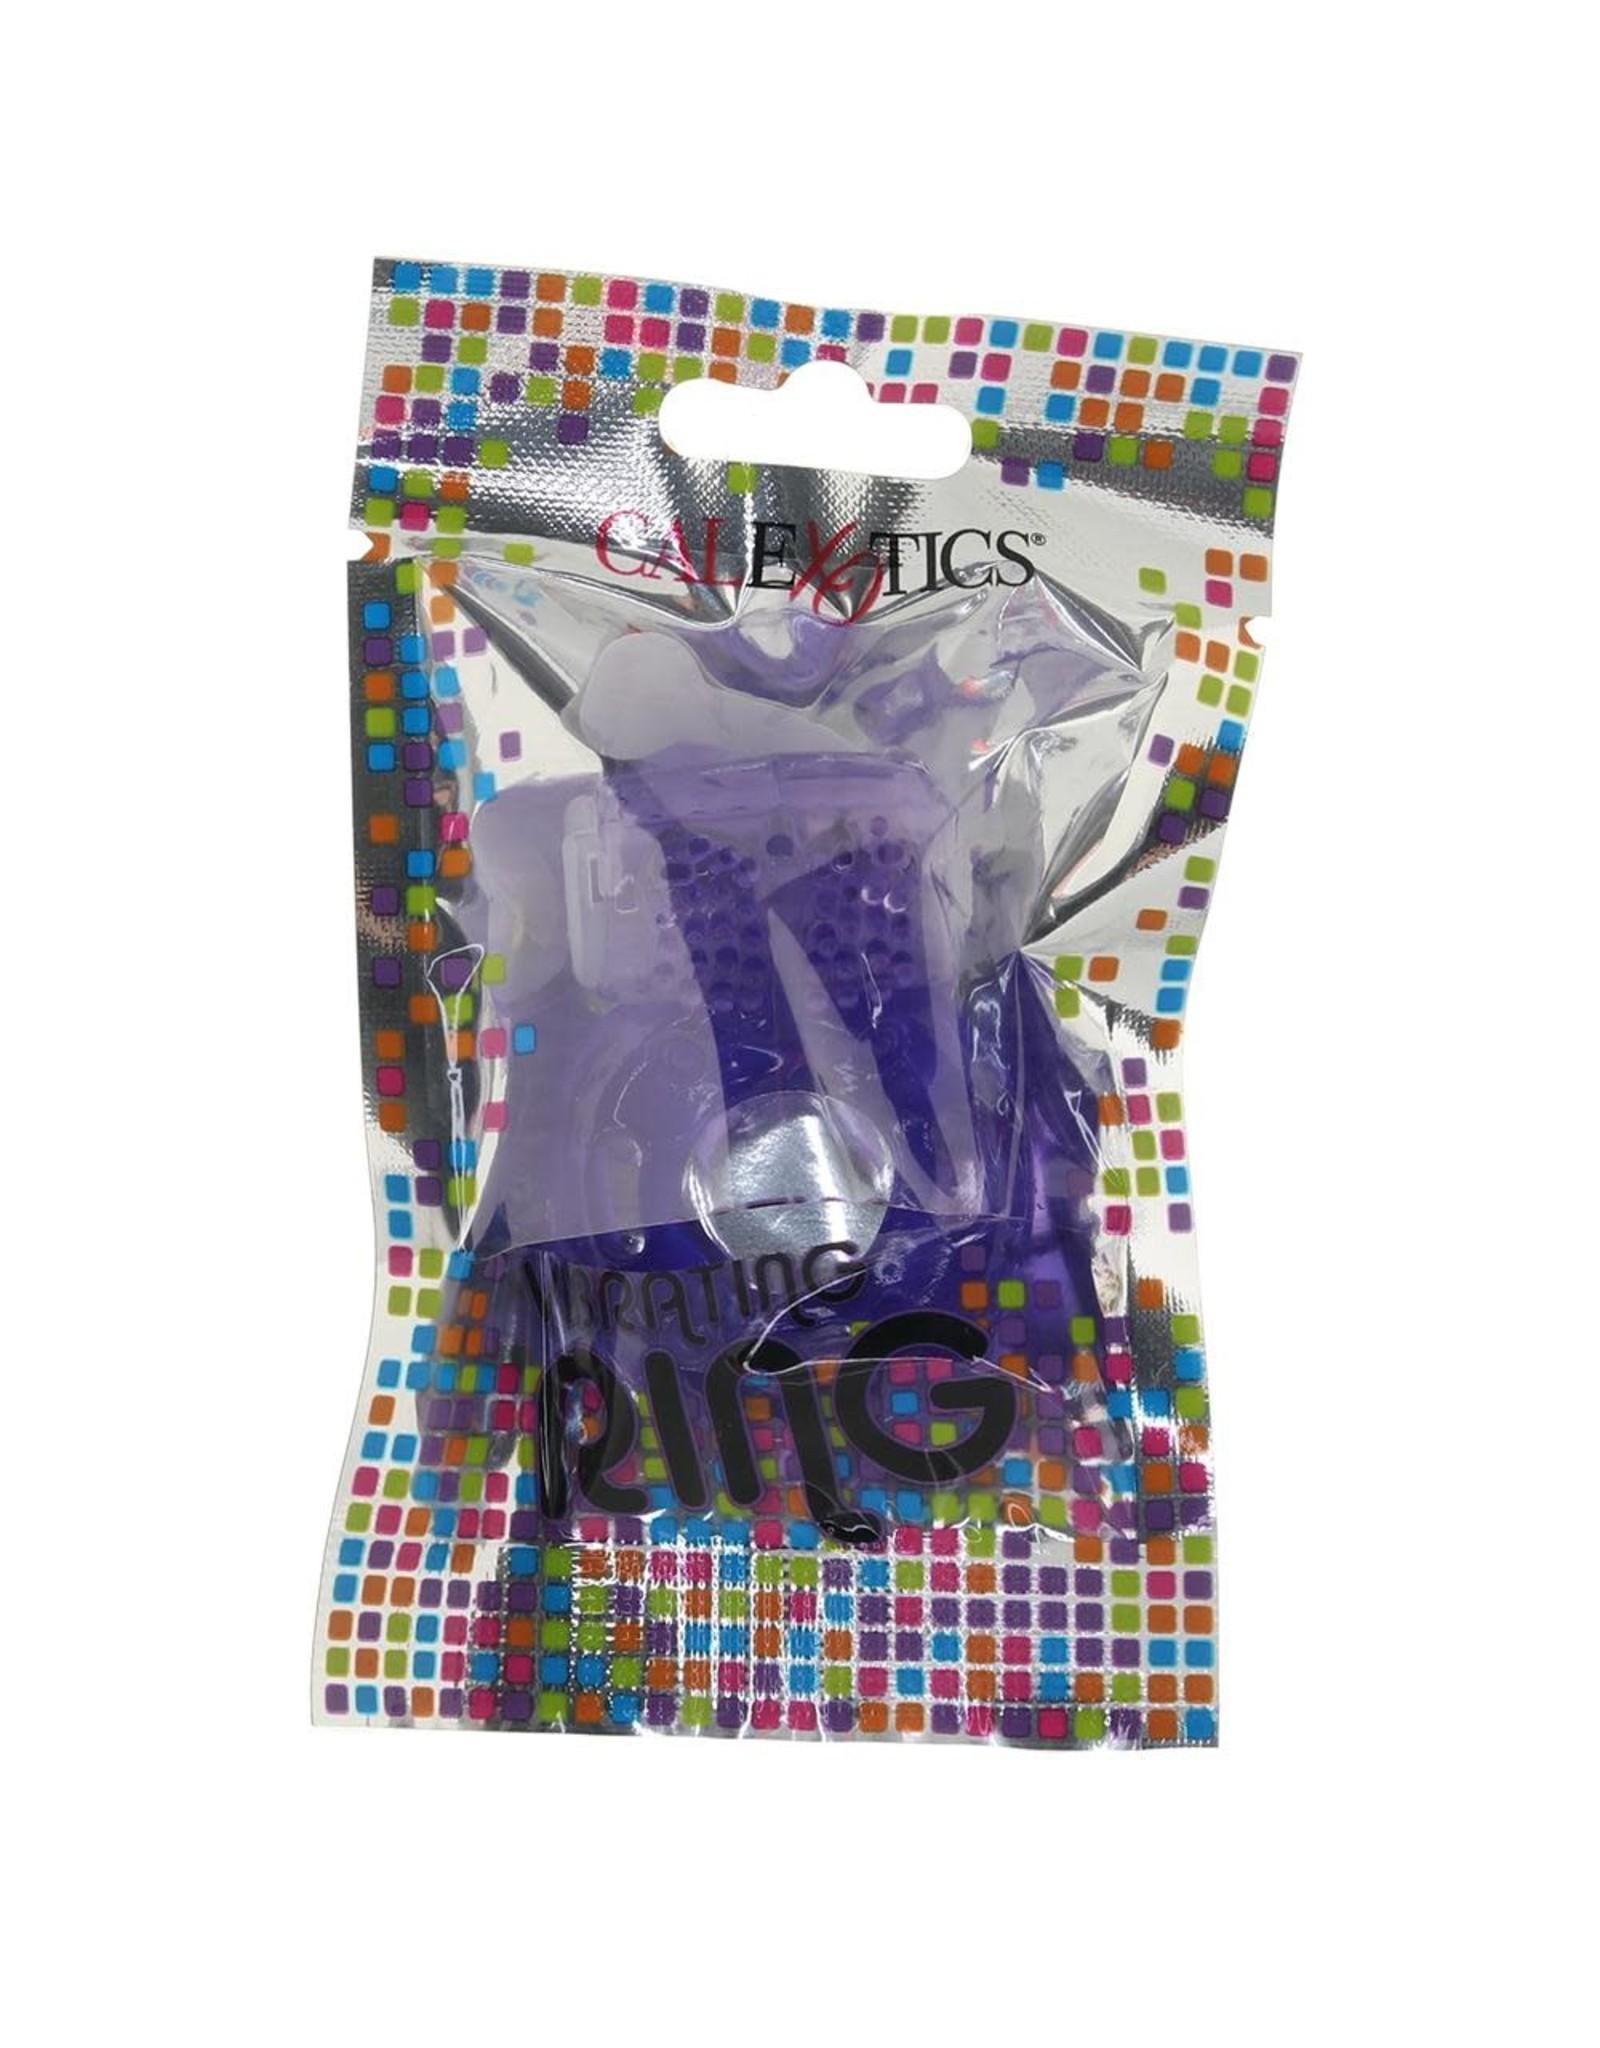 CALEXOTICS CALEXOTICS - FOIL PACK VIBRATING RING - PURPLE